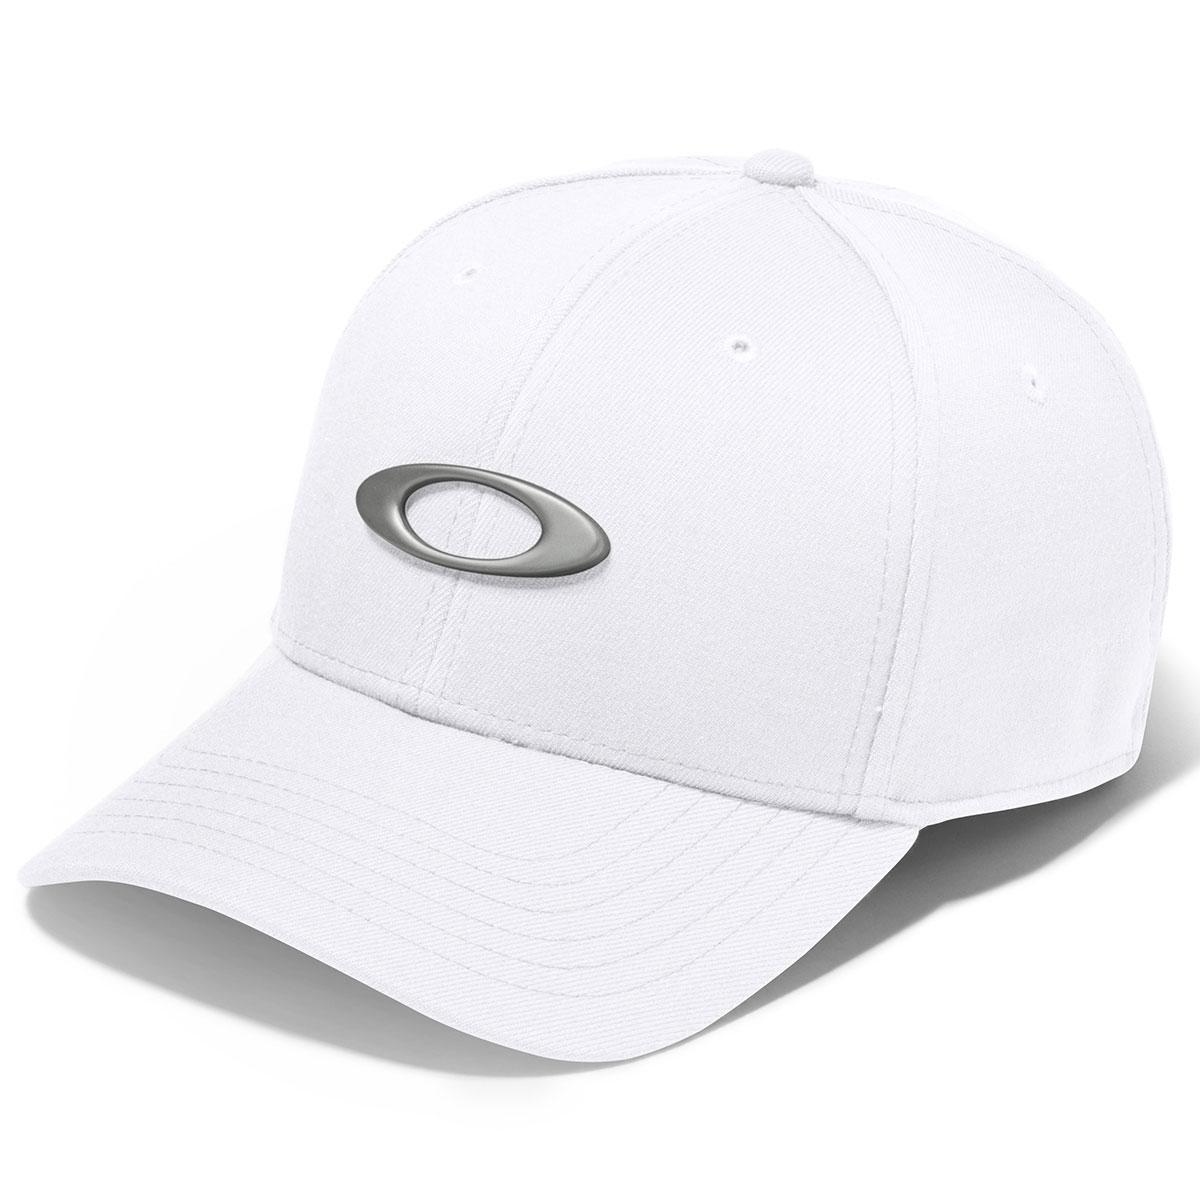 Oakley Baseball Cap Uk « Heritage Malta 0f815a5ce19